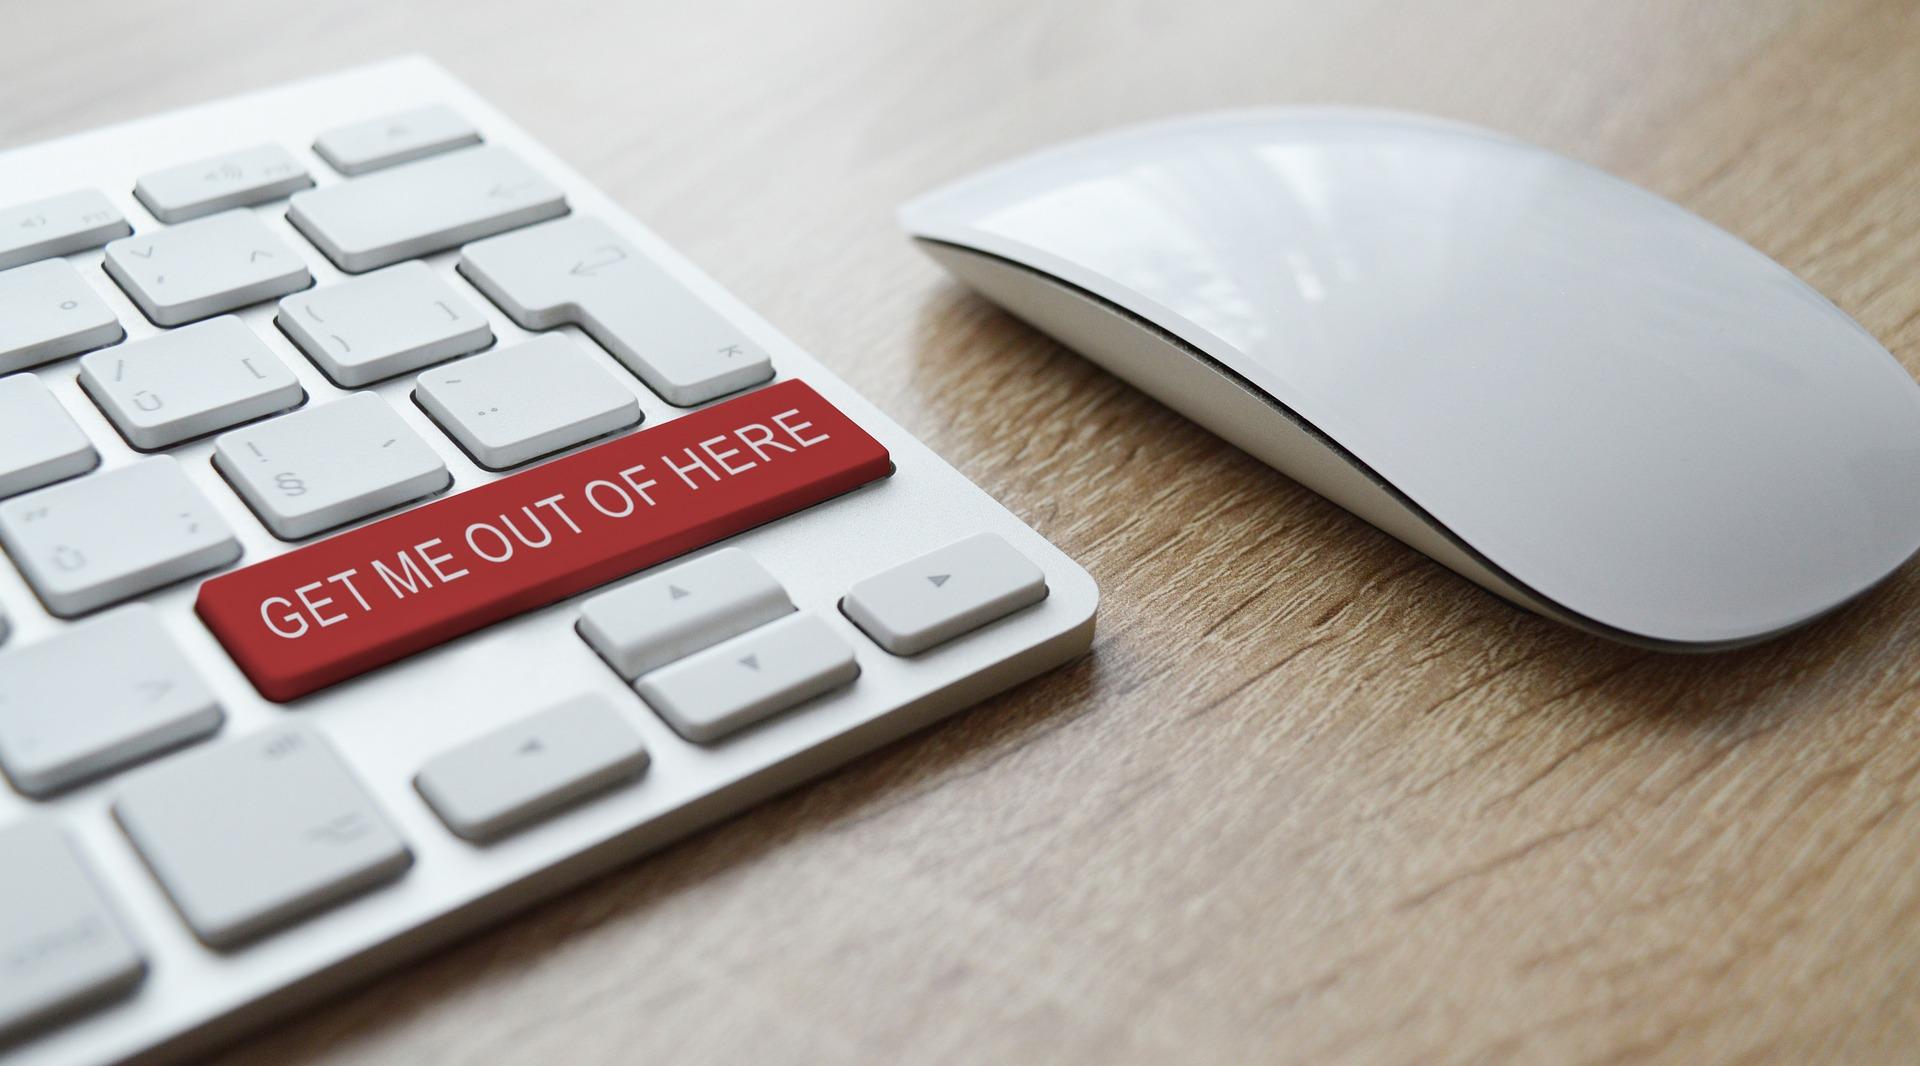 Is Mosmos Mart Myshopify a Scam or an Untrustworthy Online Store?